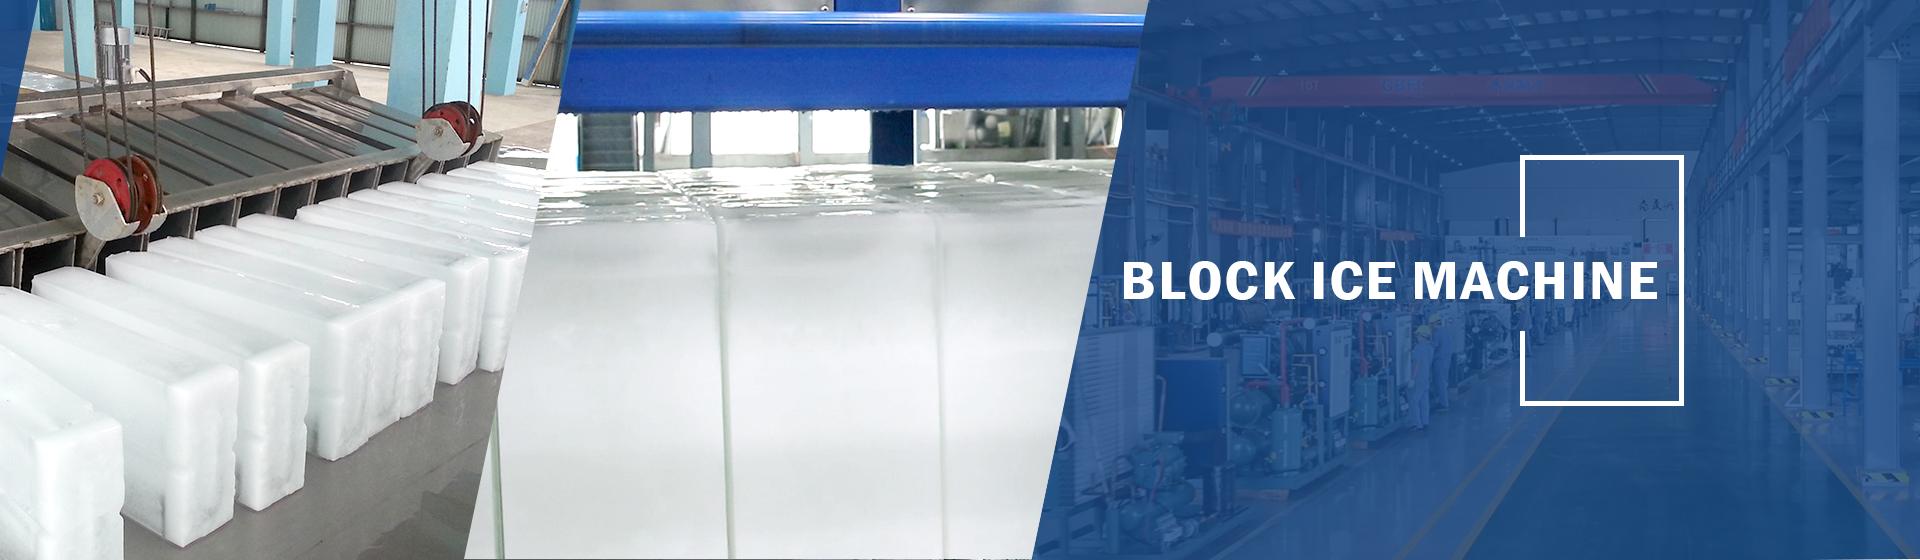 category-commercial ice block machine-CBFI-img-5